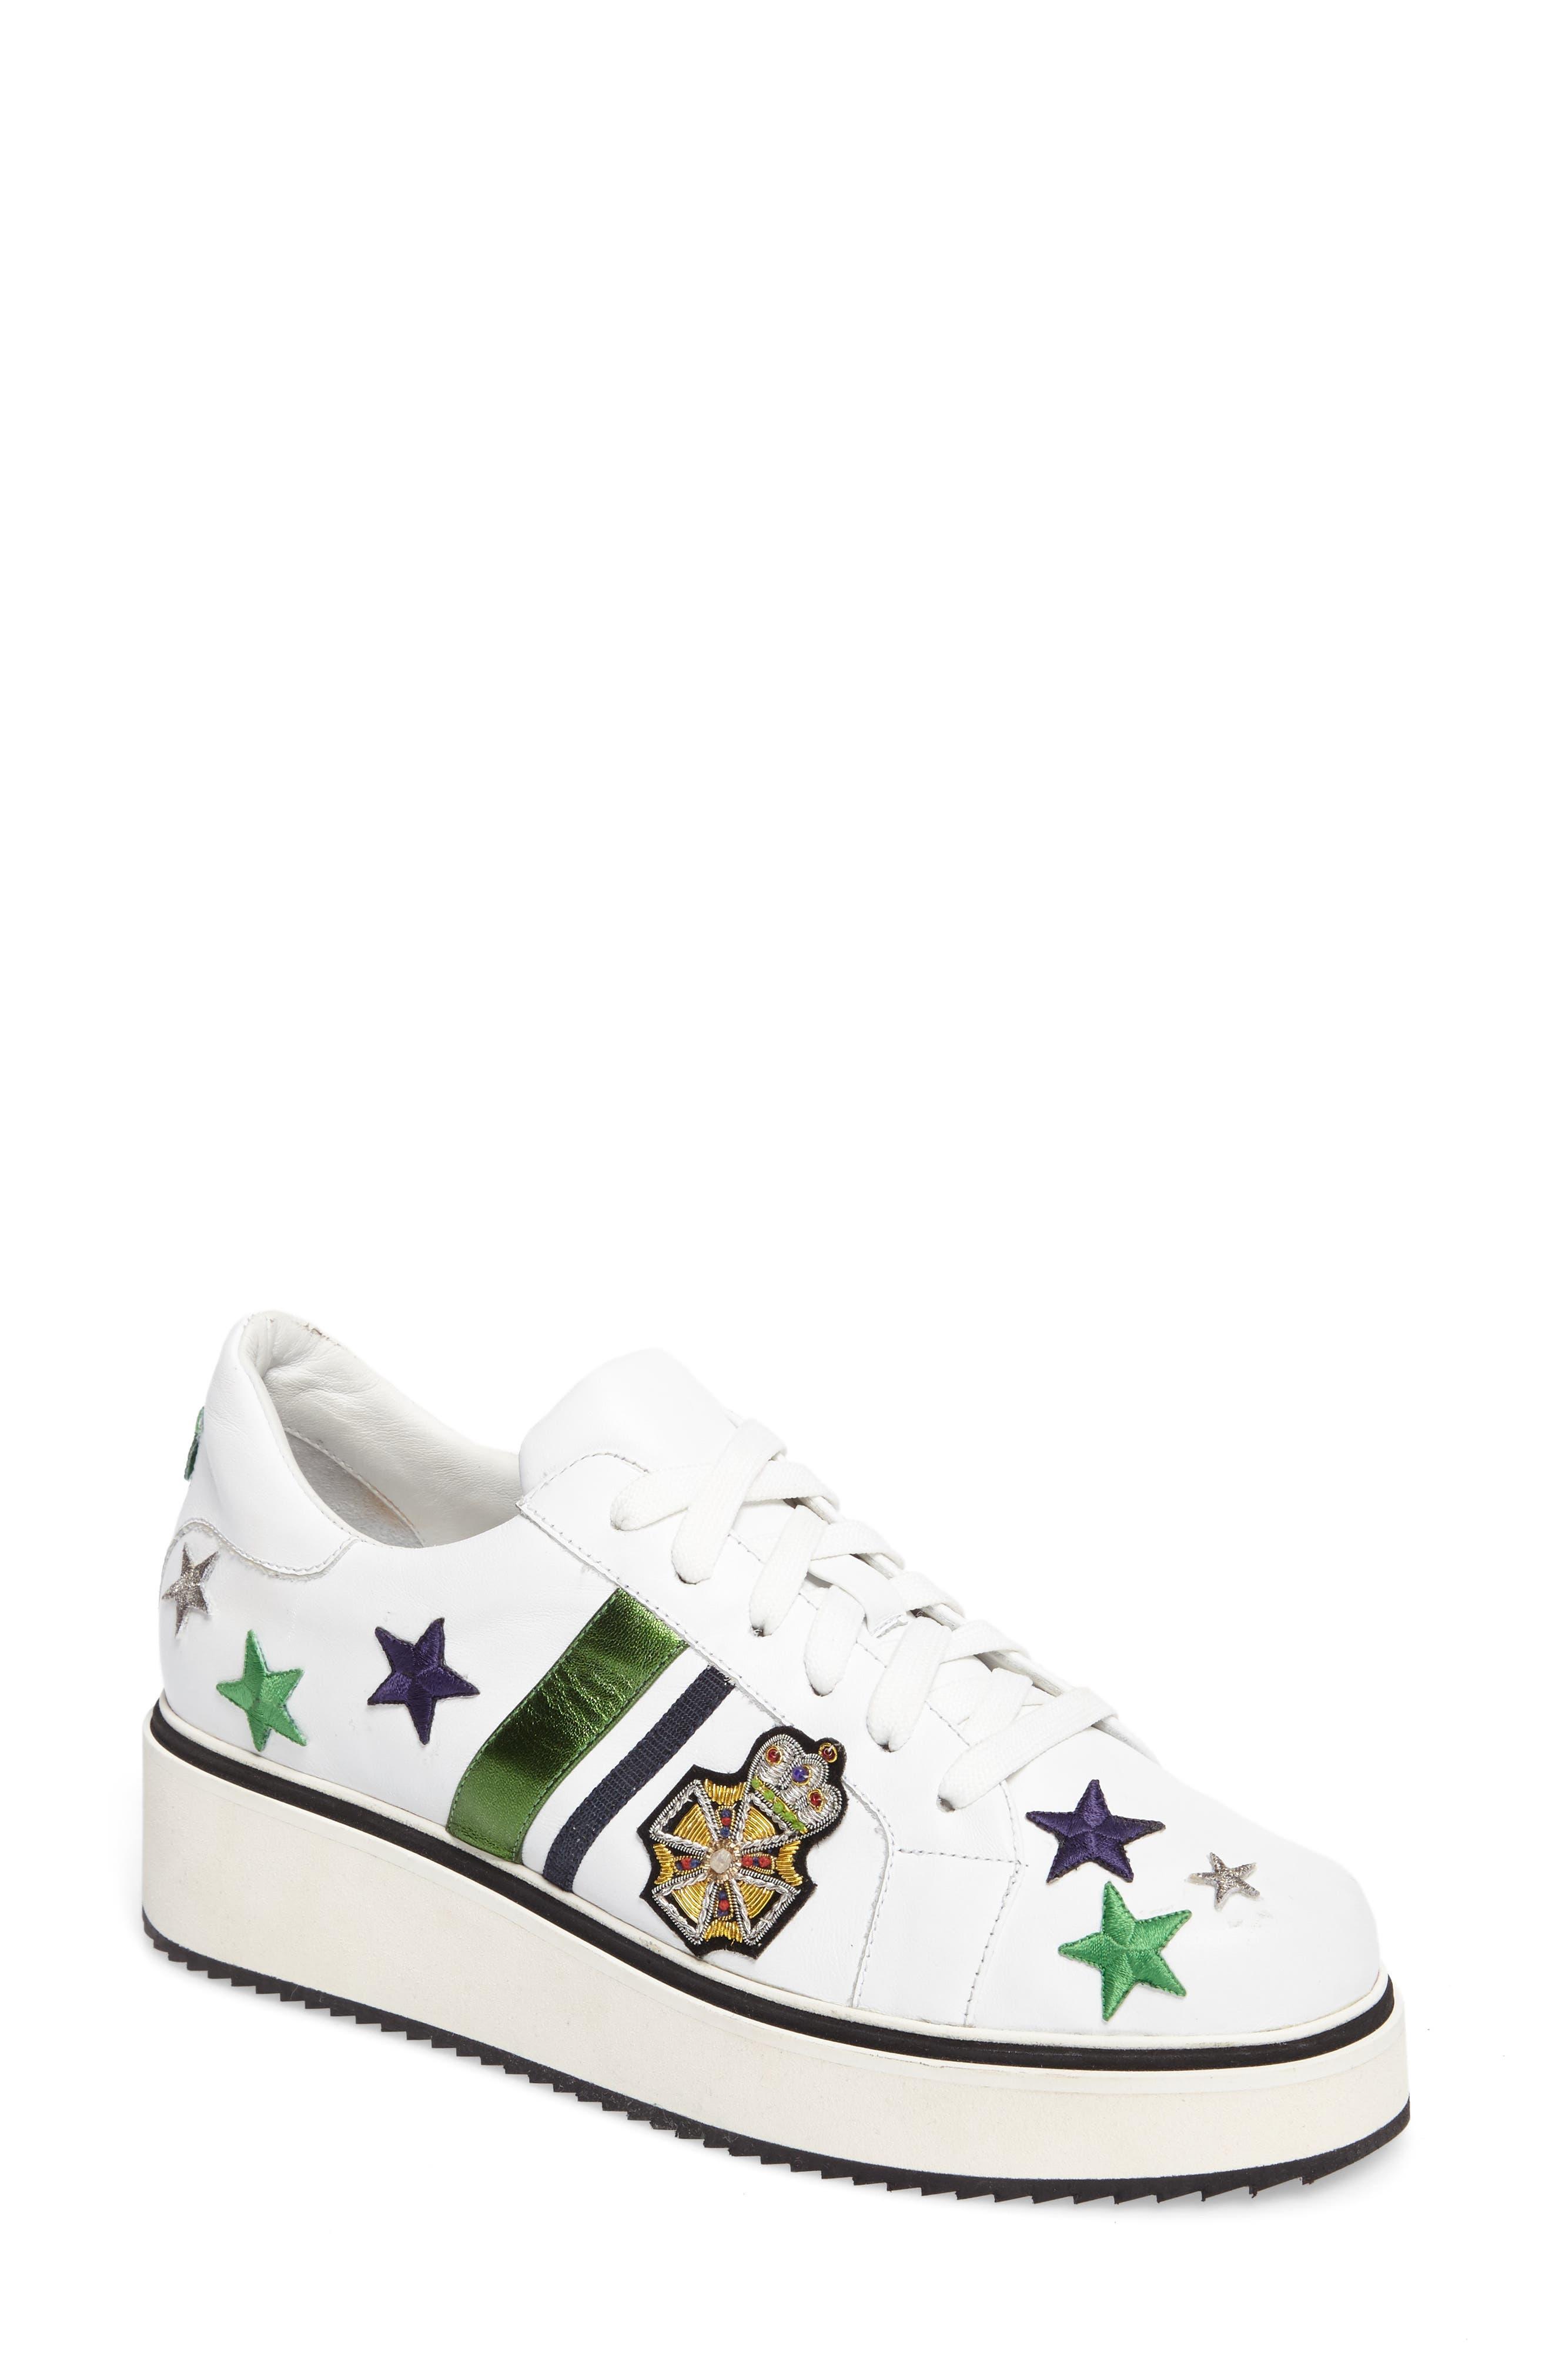 Main Image - Veronica Beard Emmerson Embellished Sneaker (Women)